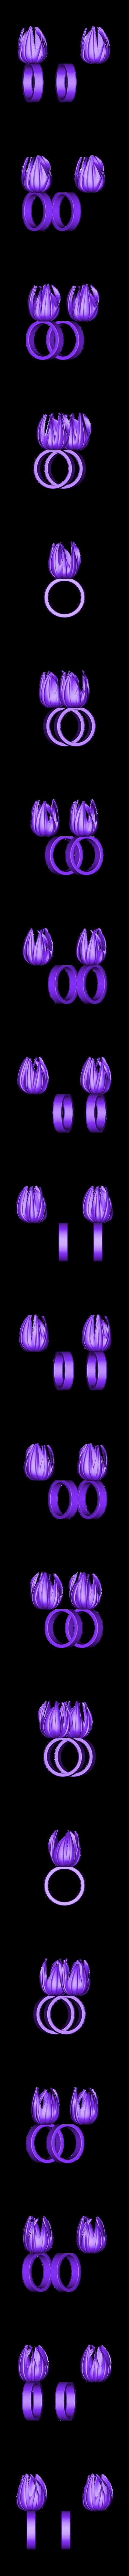 Blossom.obj Download OBJ file Blossom • 3D print object, josephkey